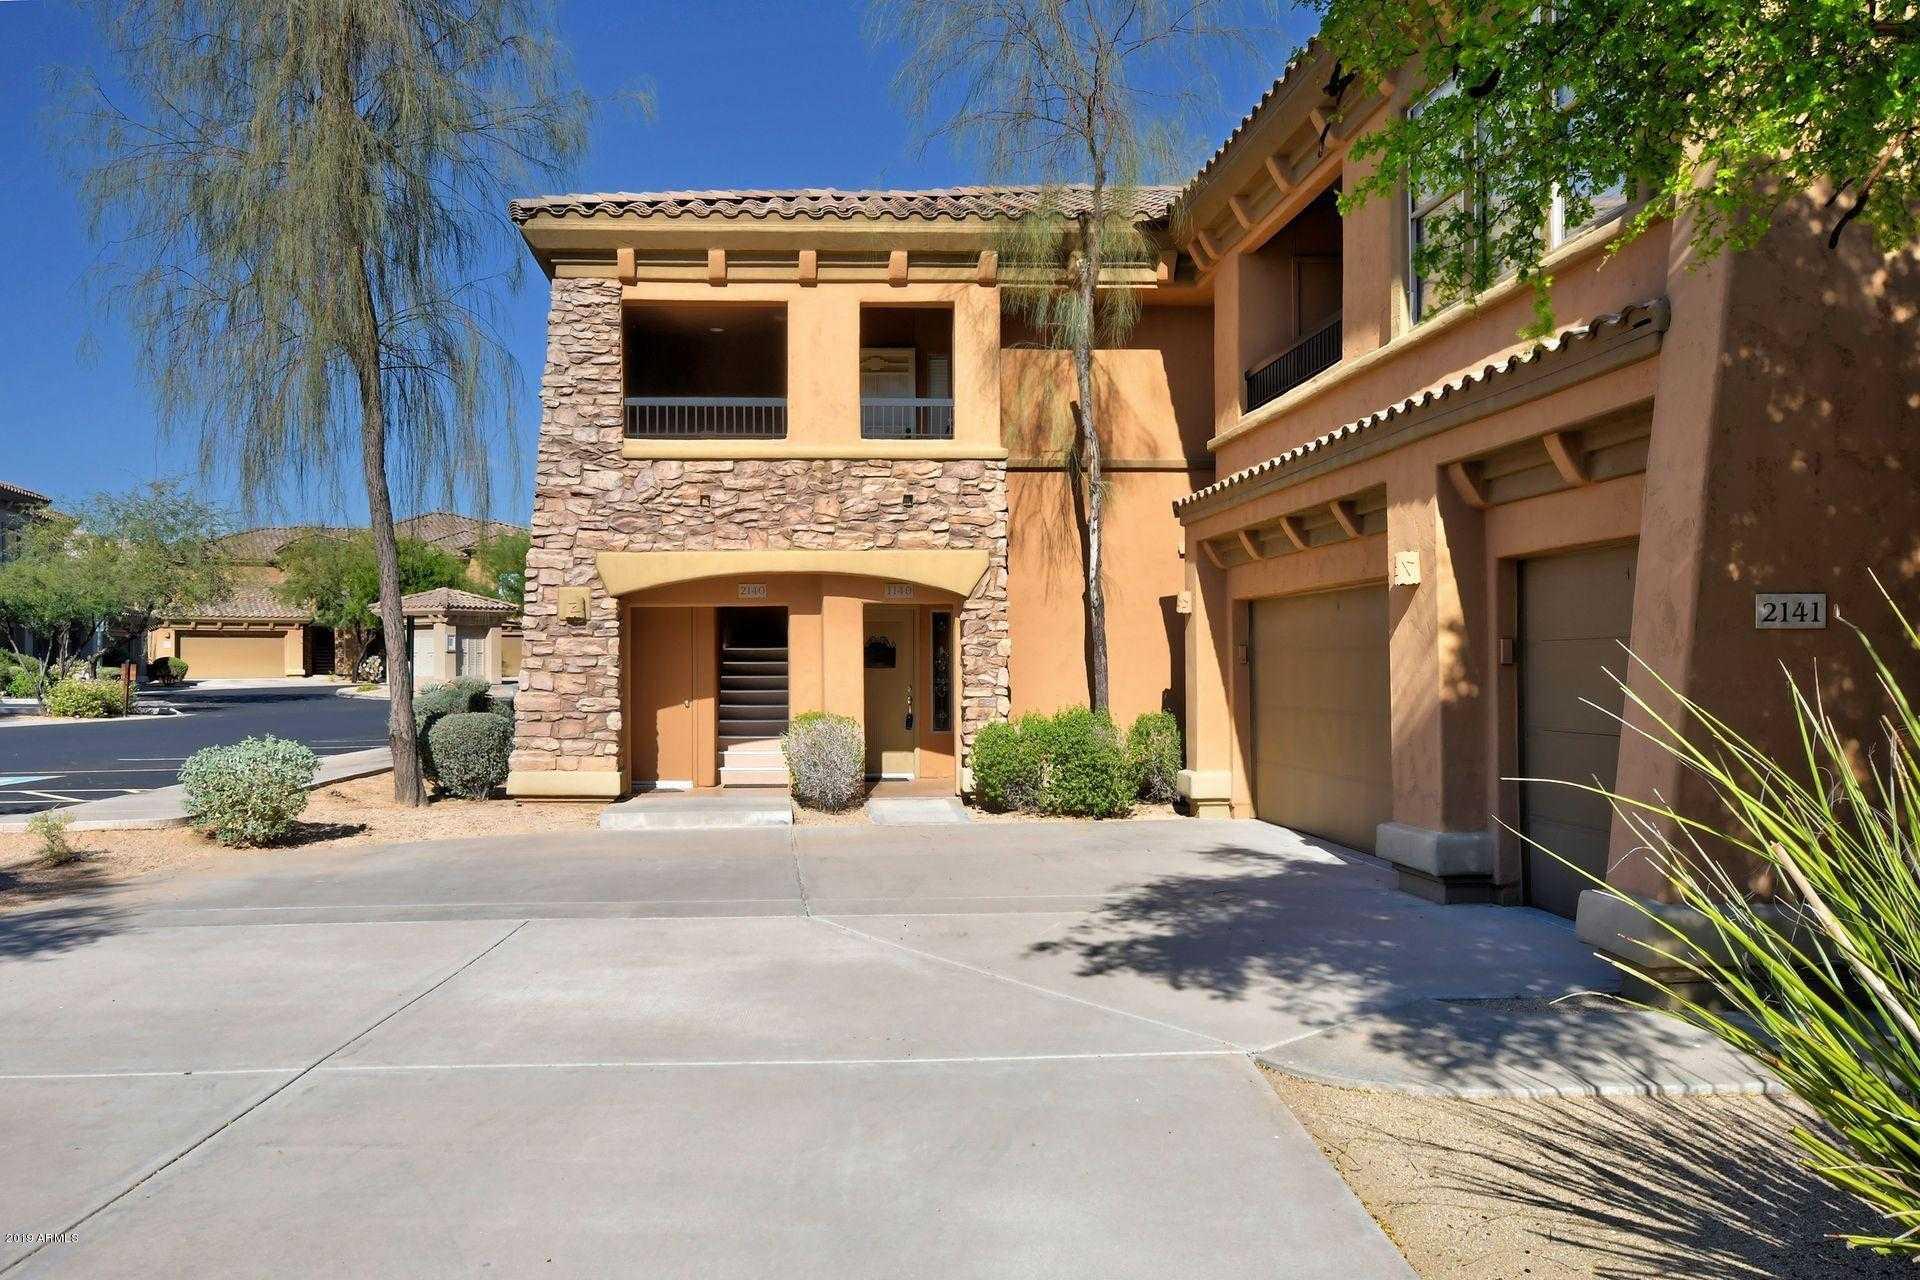 $394,500 - 3Br/2Ba -  for Sale in Village At Grayhawk Condominium Phase 2, Scottsdale